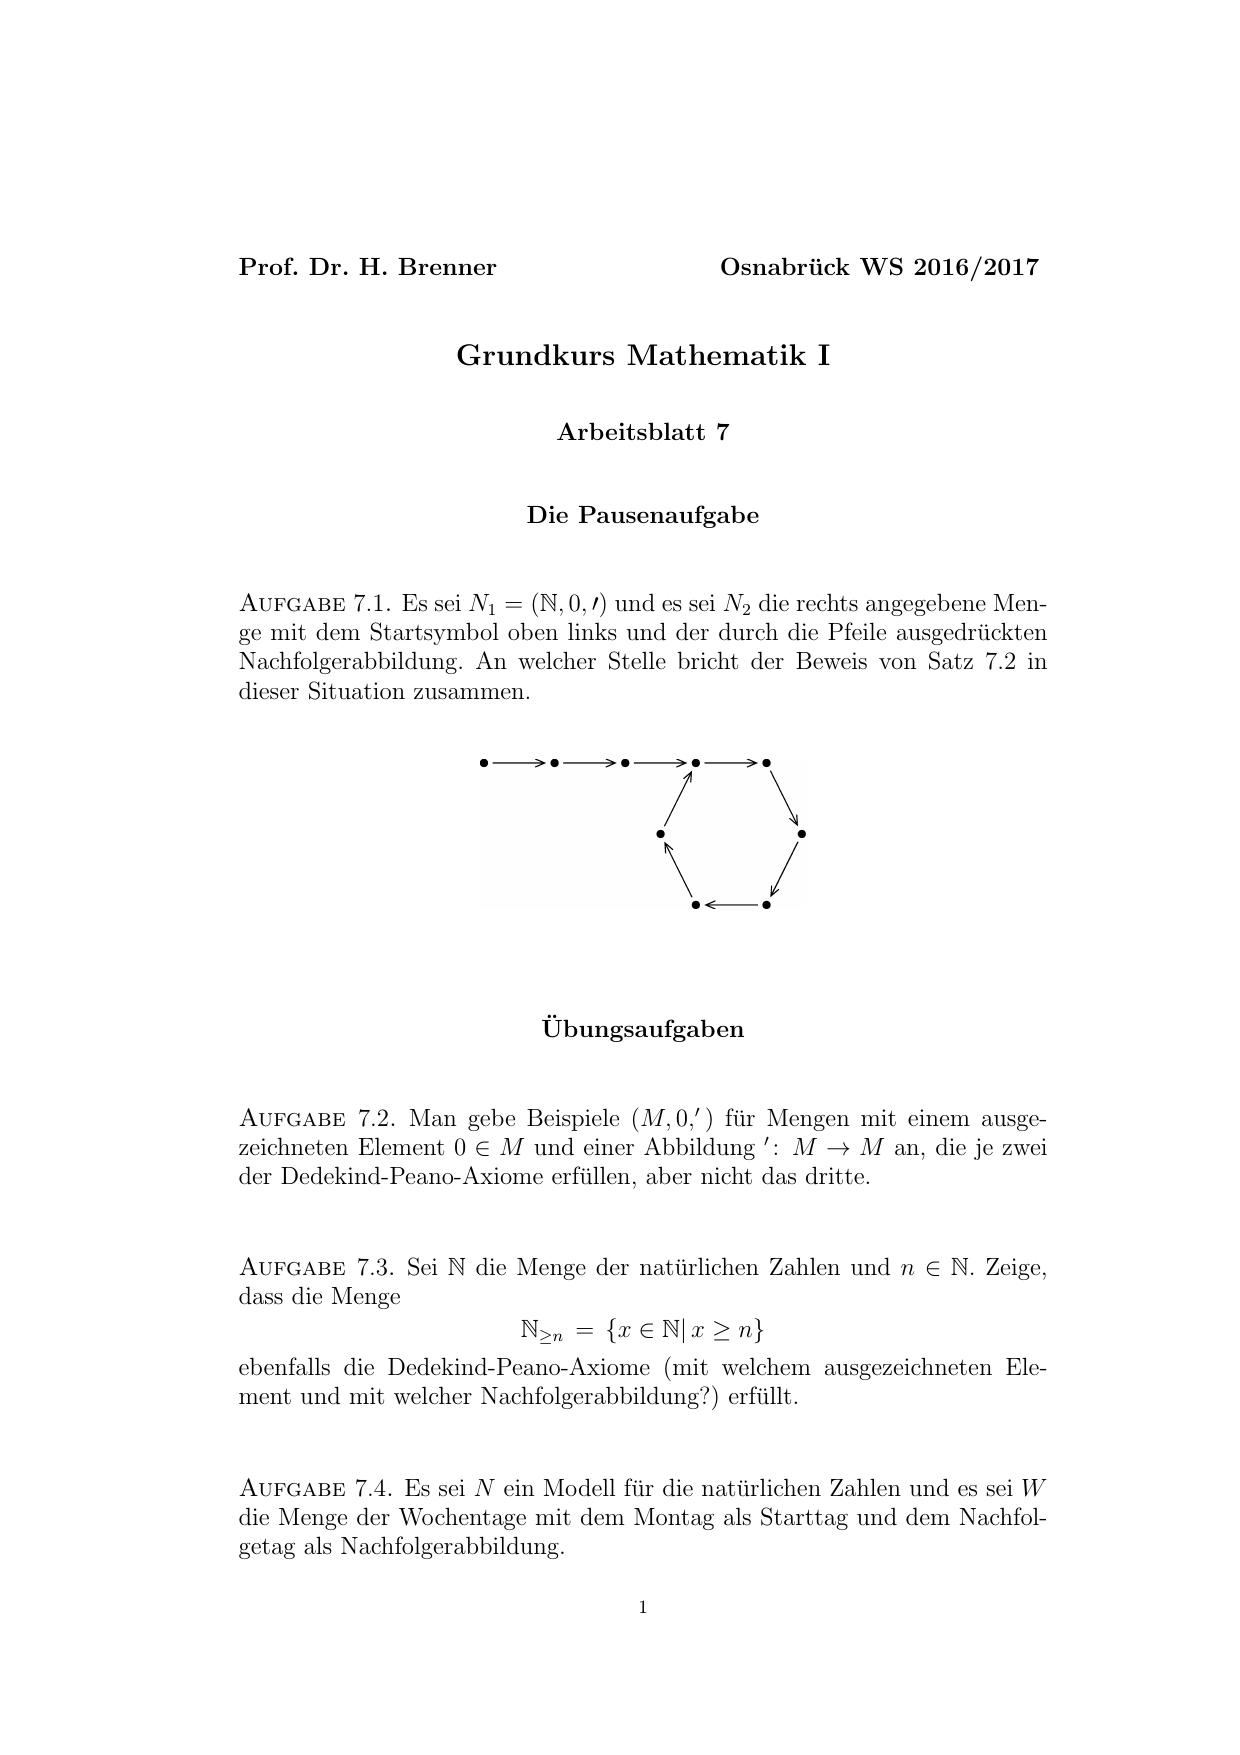 Großzügig Math Mengen Und Teilmengen Arbeitsblatt Ideen - Gemischte ...